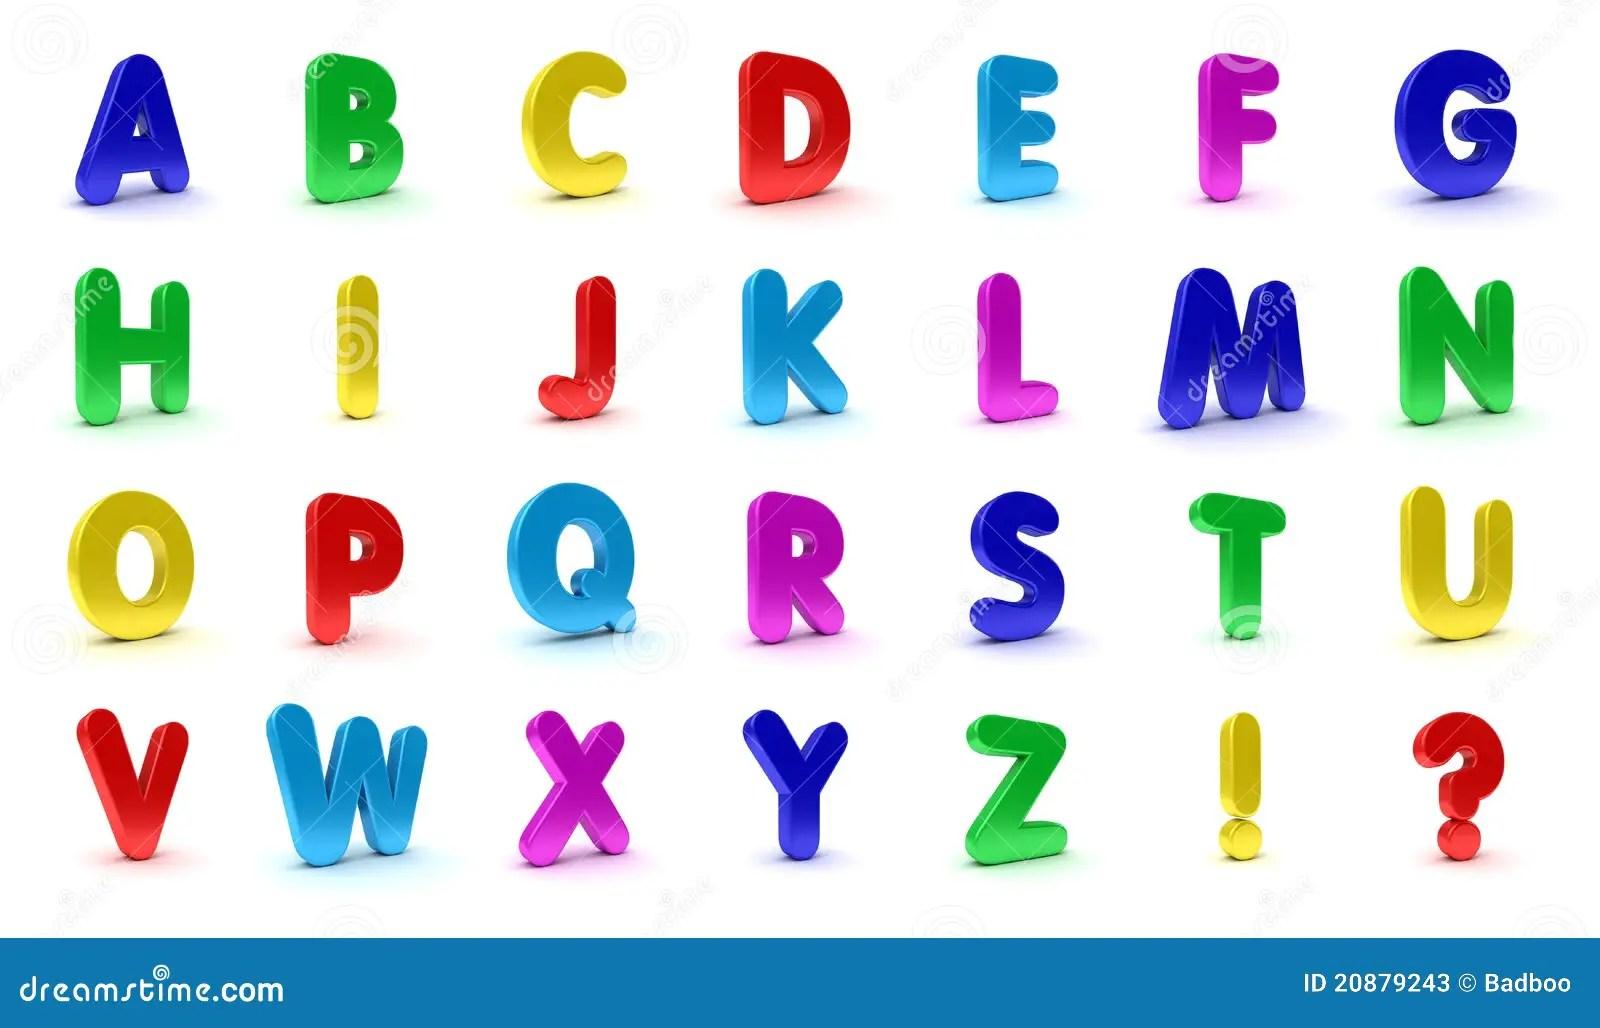 Best 25 Kindergarten Welcome Letter Ideas On Pinterest Fridge Magnet Alphabet Stock Photos Image 20879243